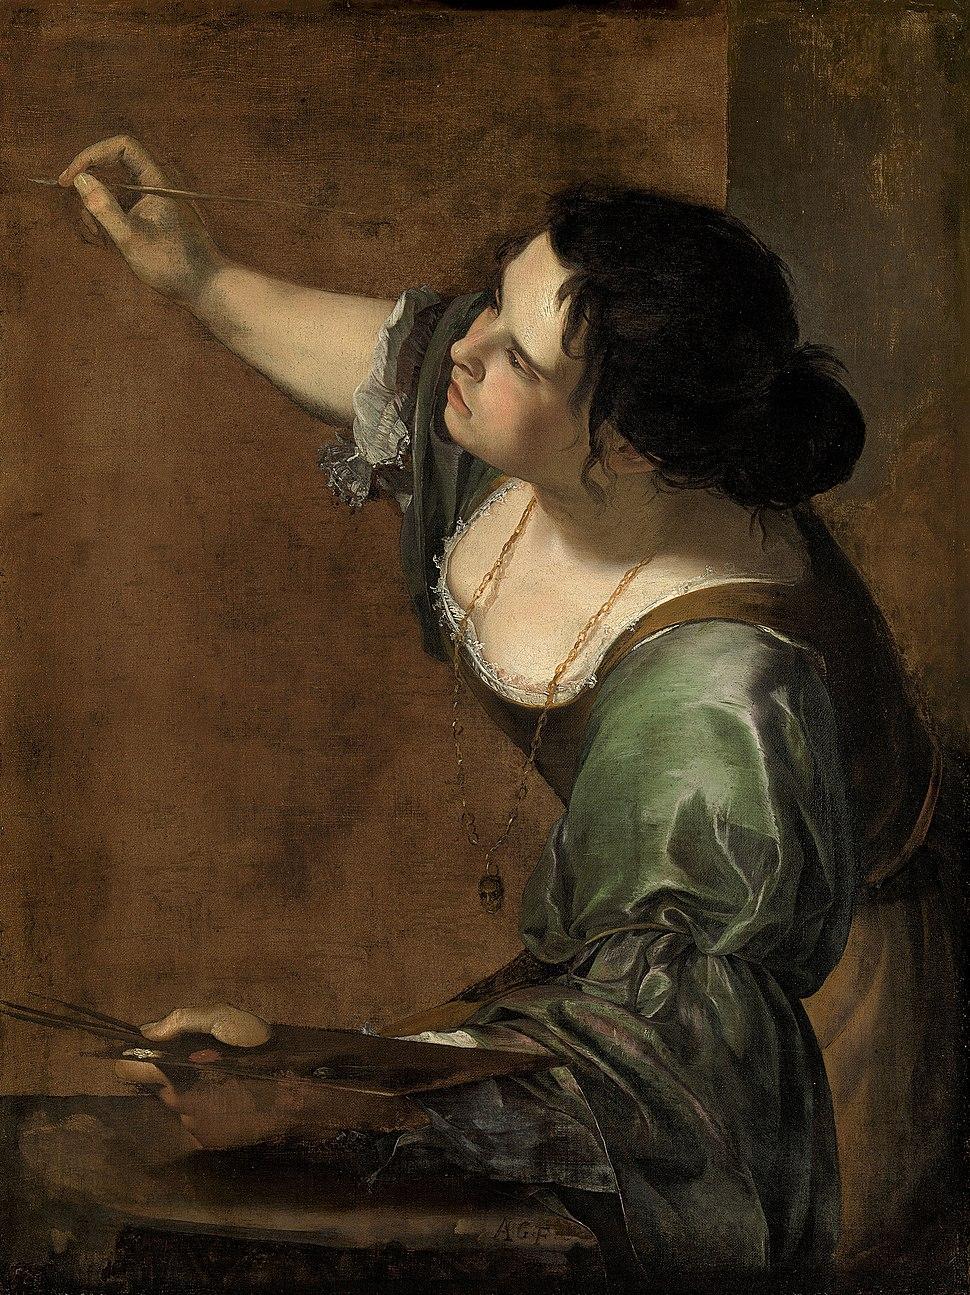 Self-portrait as the Allegory of Painting (La Pittura) - Artemisia Gentileschi